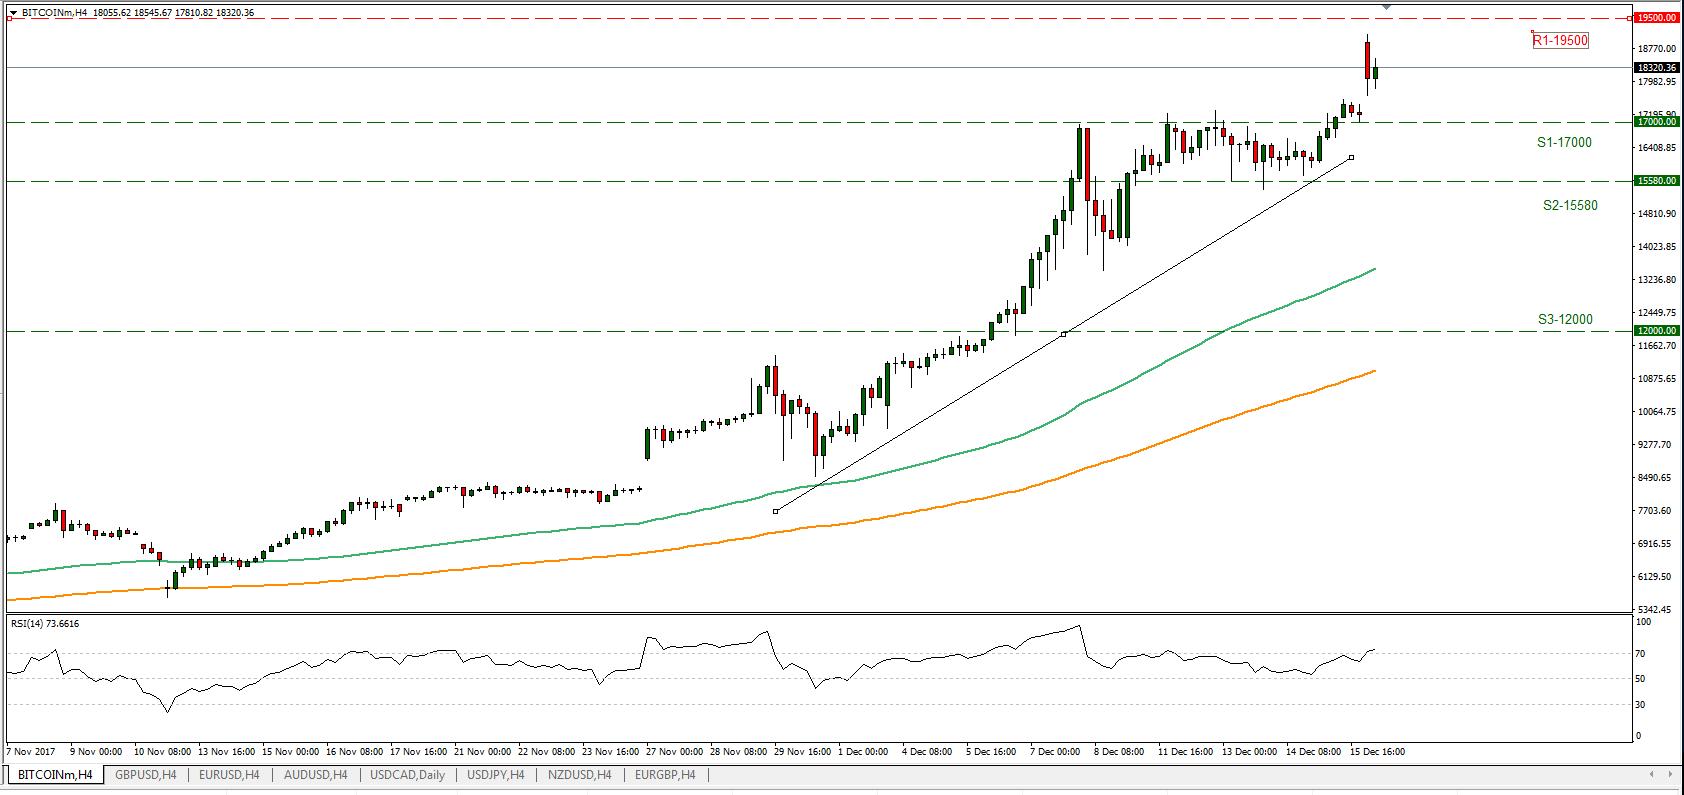 BTC/USD 18/12/2017 | Econ Alerts